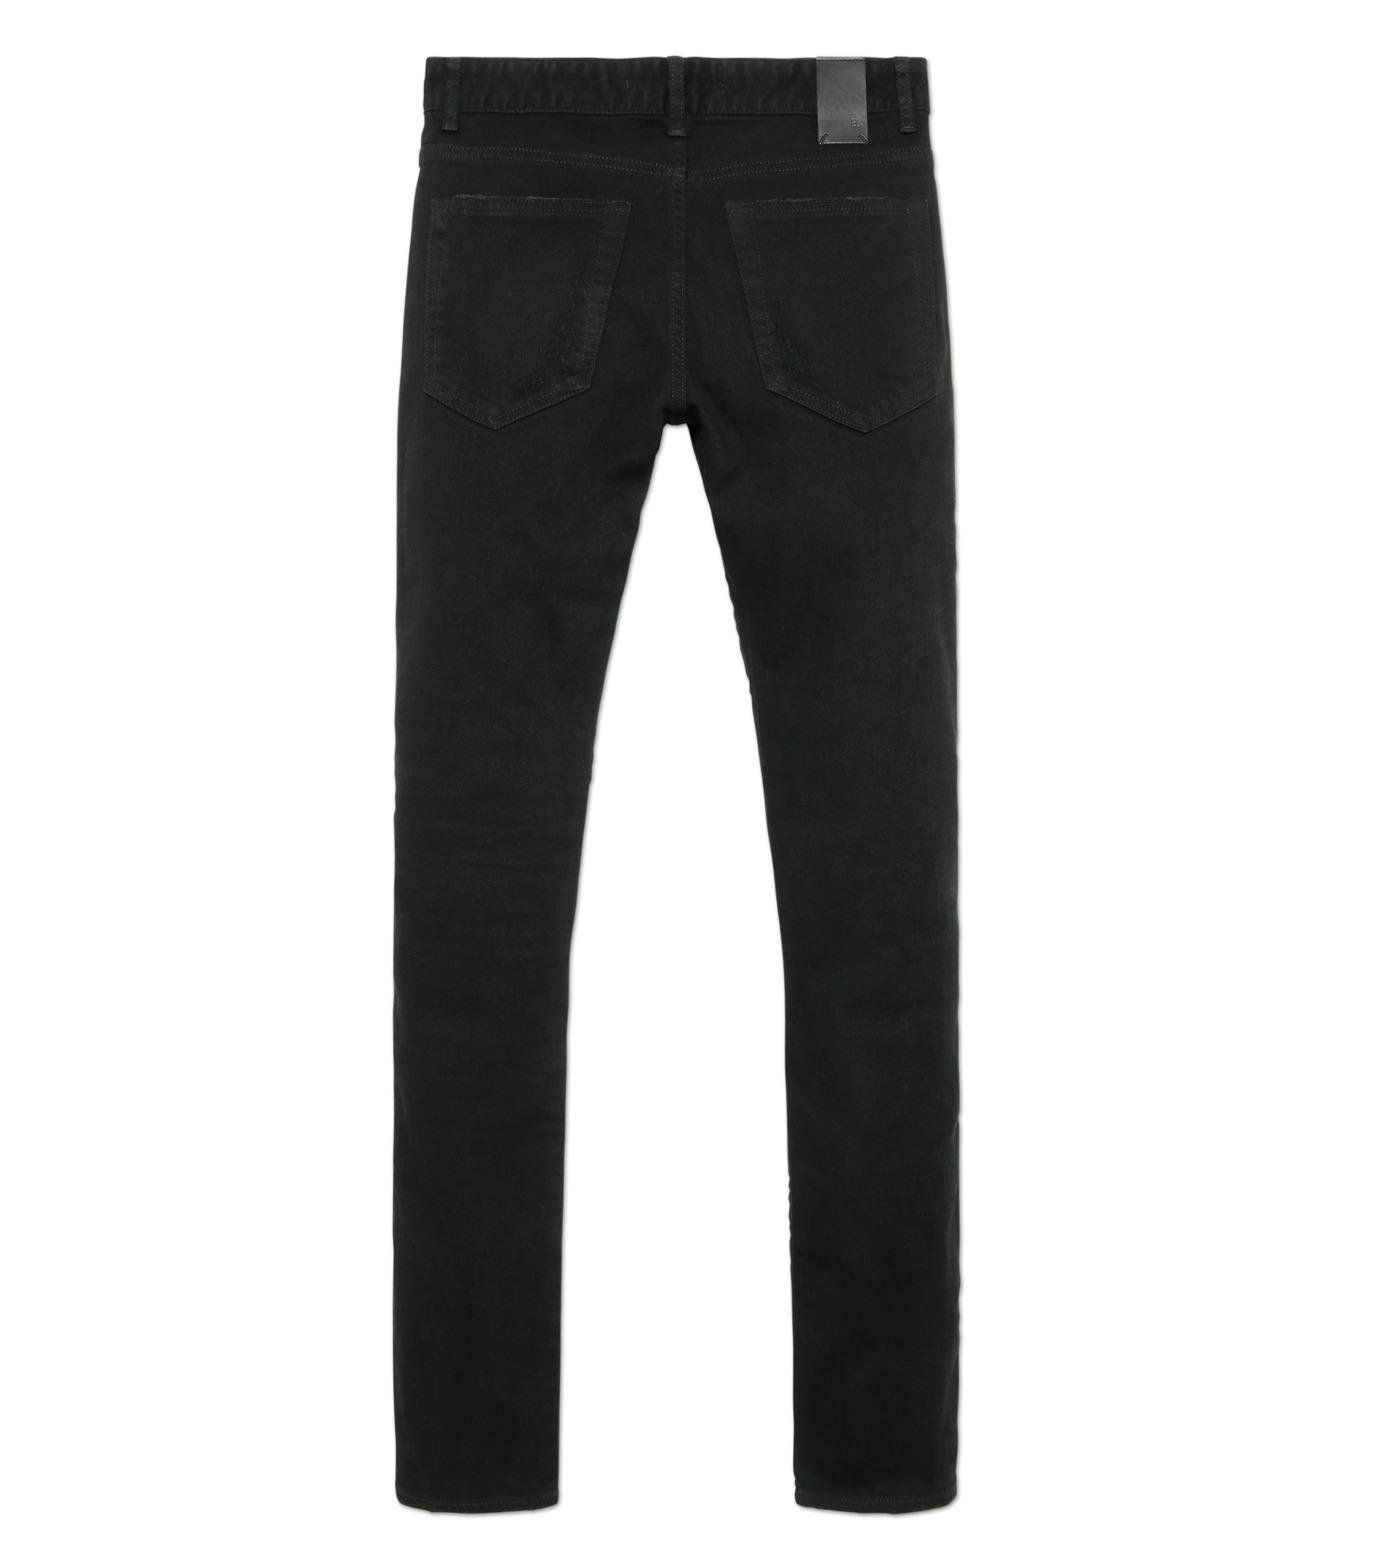 HL HEDDIE LOVU(エイチエル・エディールーヴ)のblk damage3 skin slim-BLACK(パンツ/pants)-18S98003-13 拡大詳細画像5